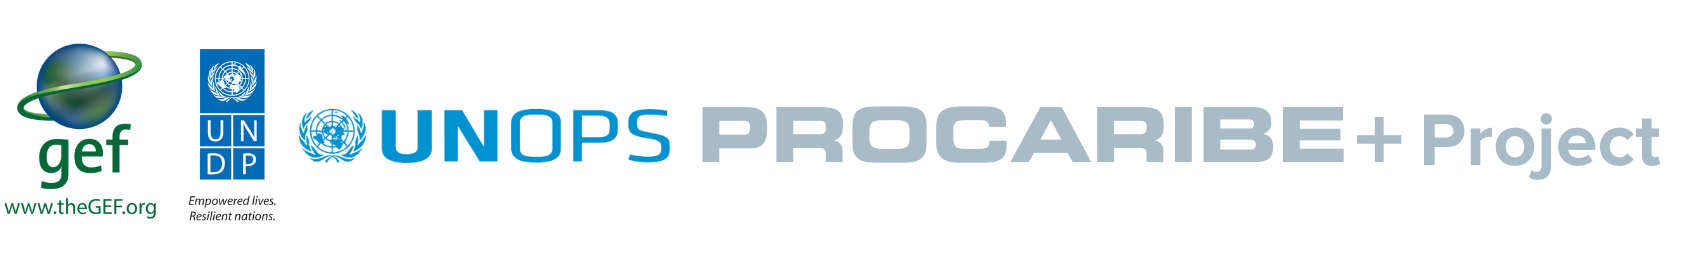 PROCARIBE logo